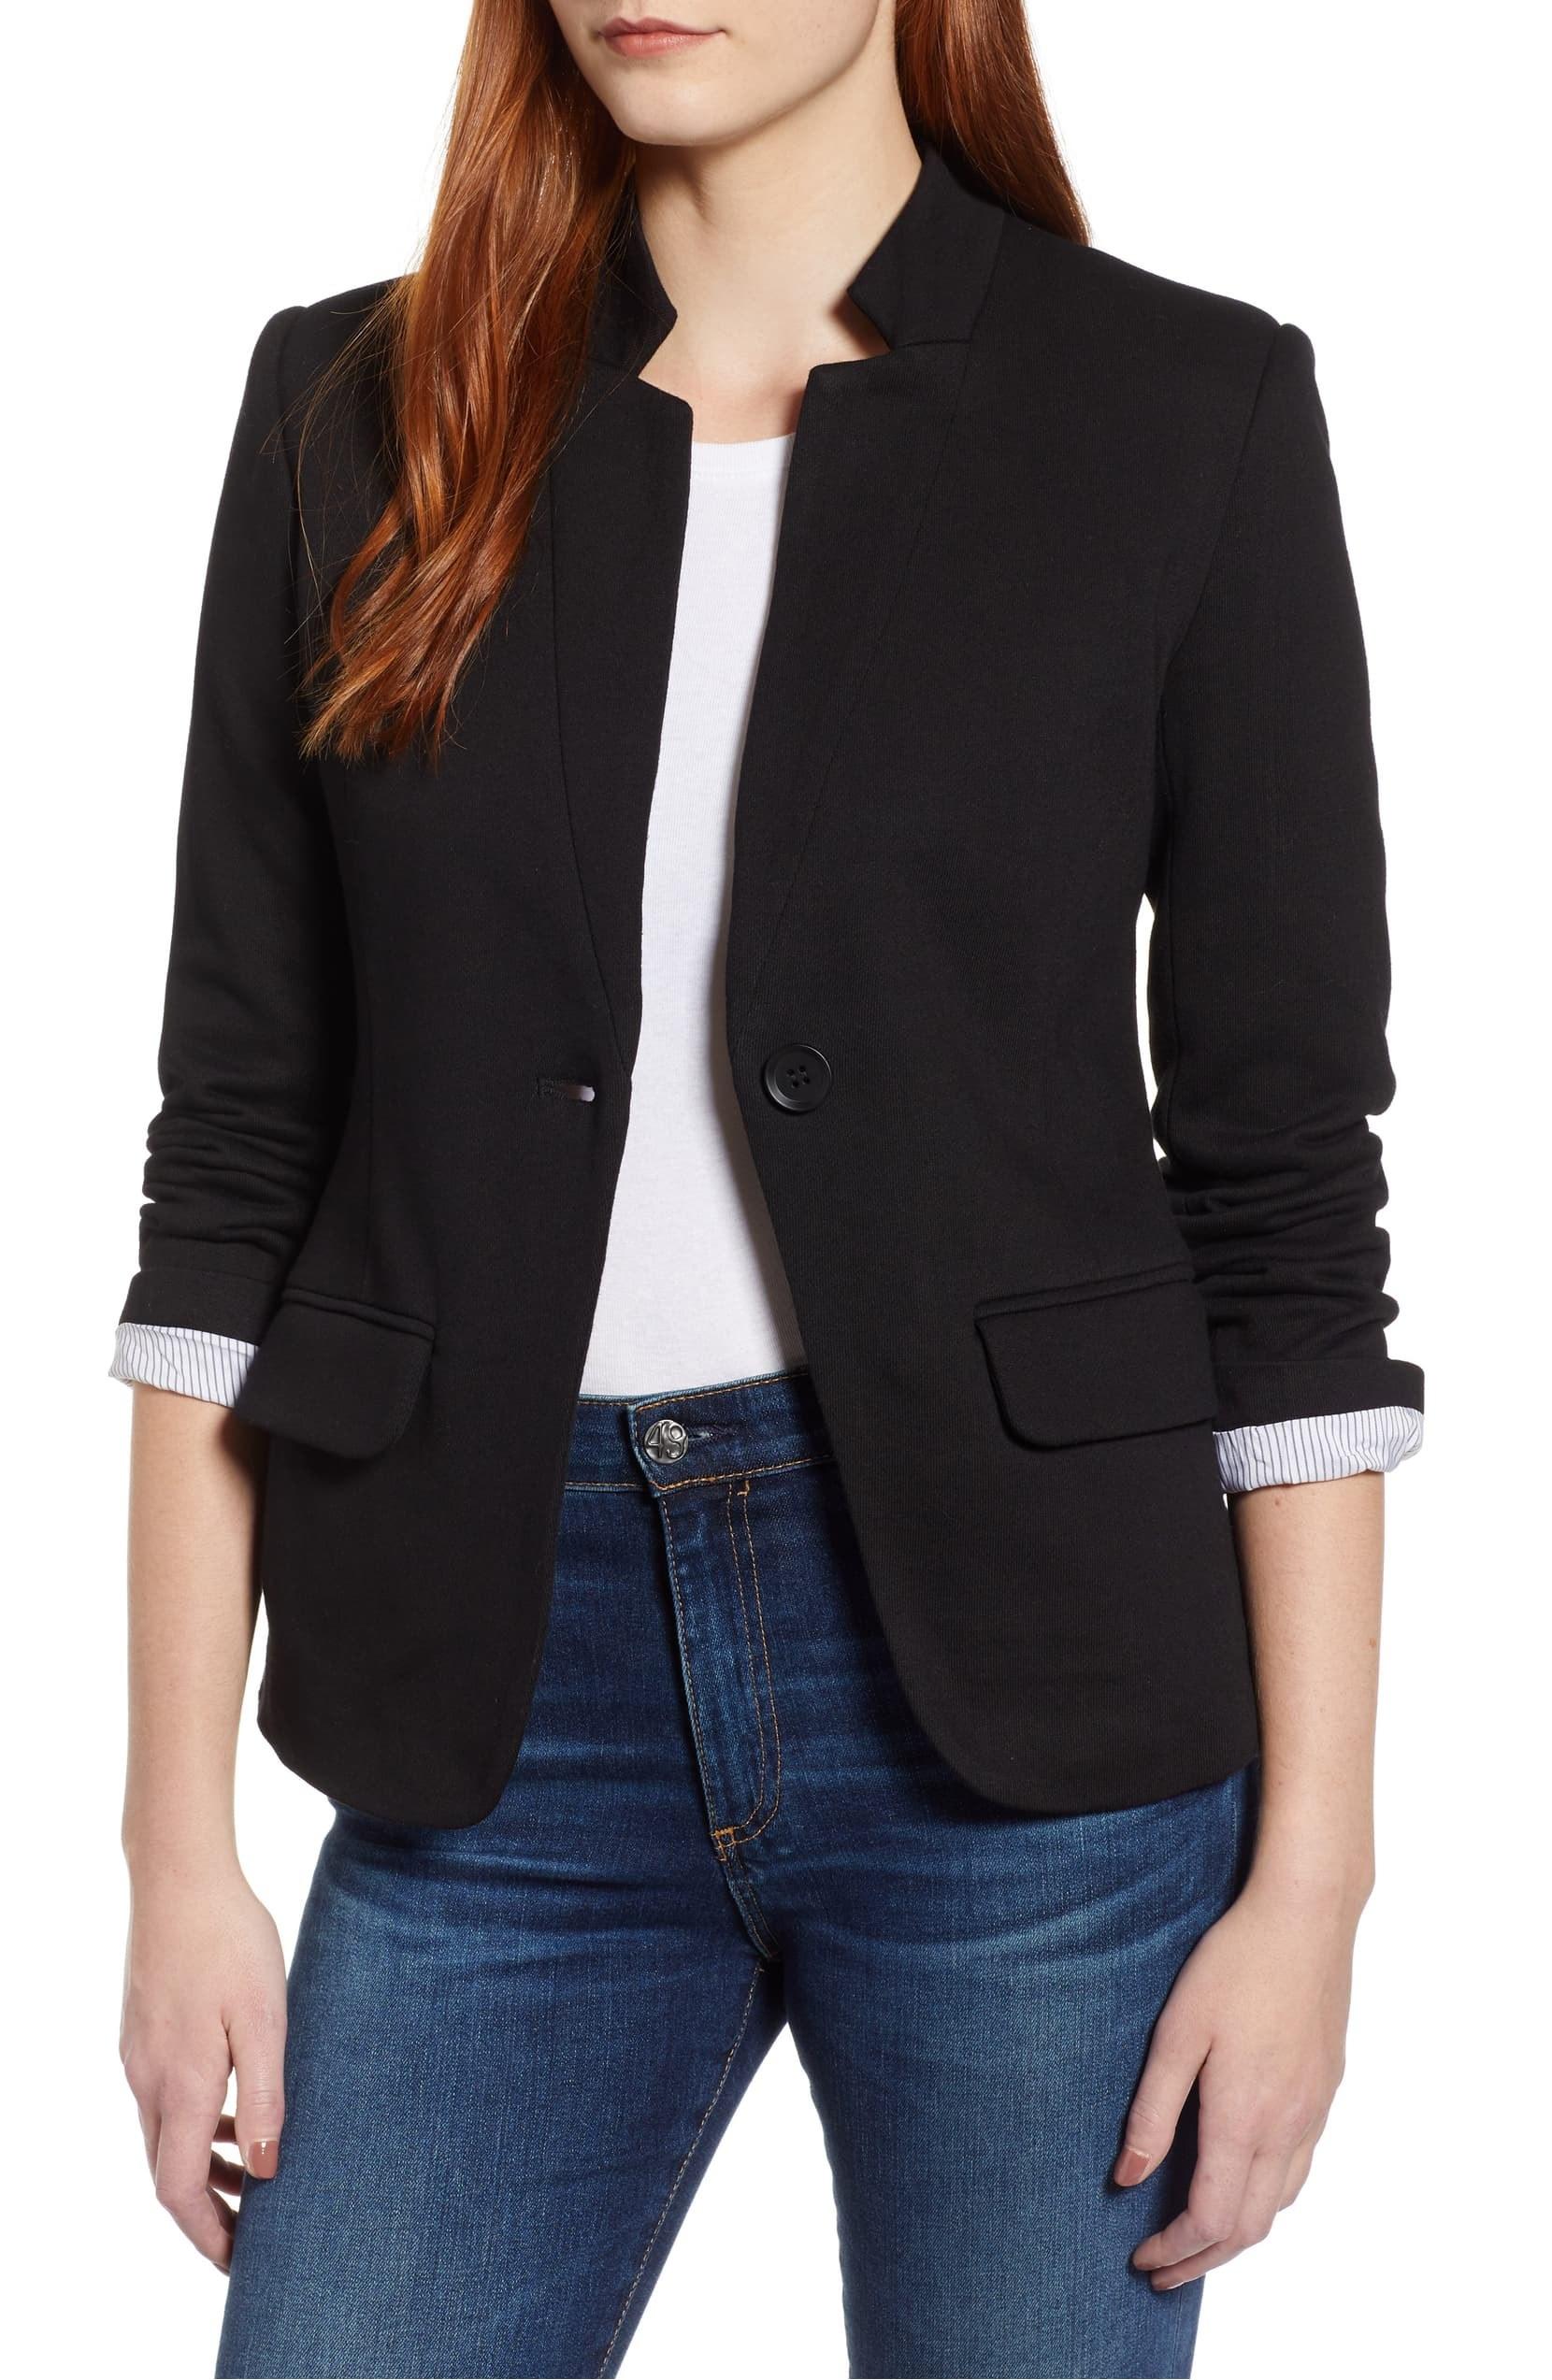 A model wearing the Gibson Notch Collar Cotton Blend Blazer in black.